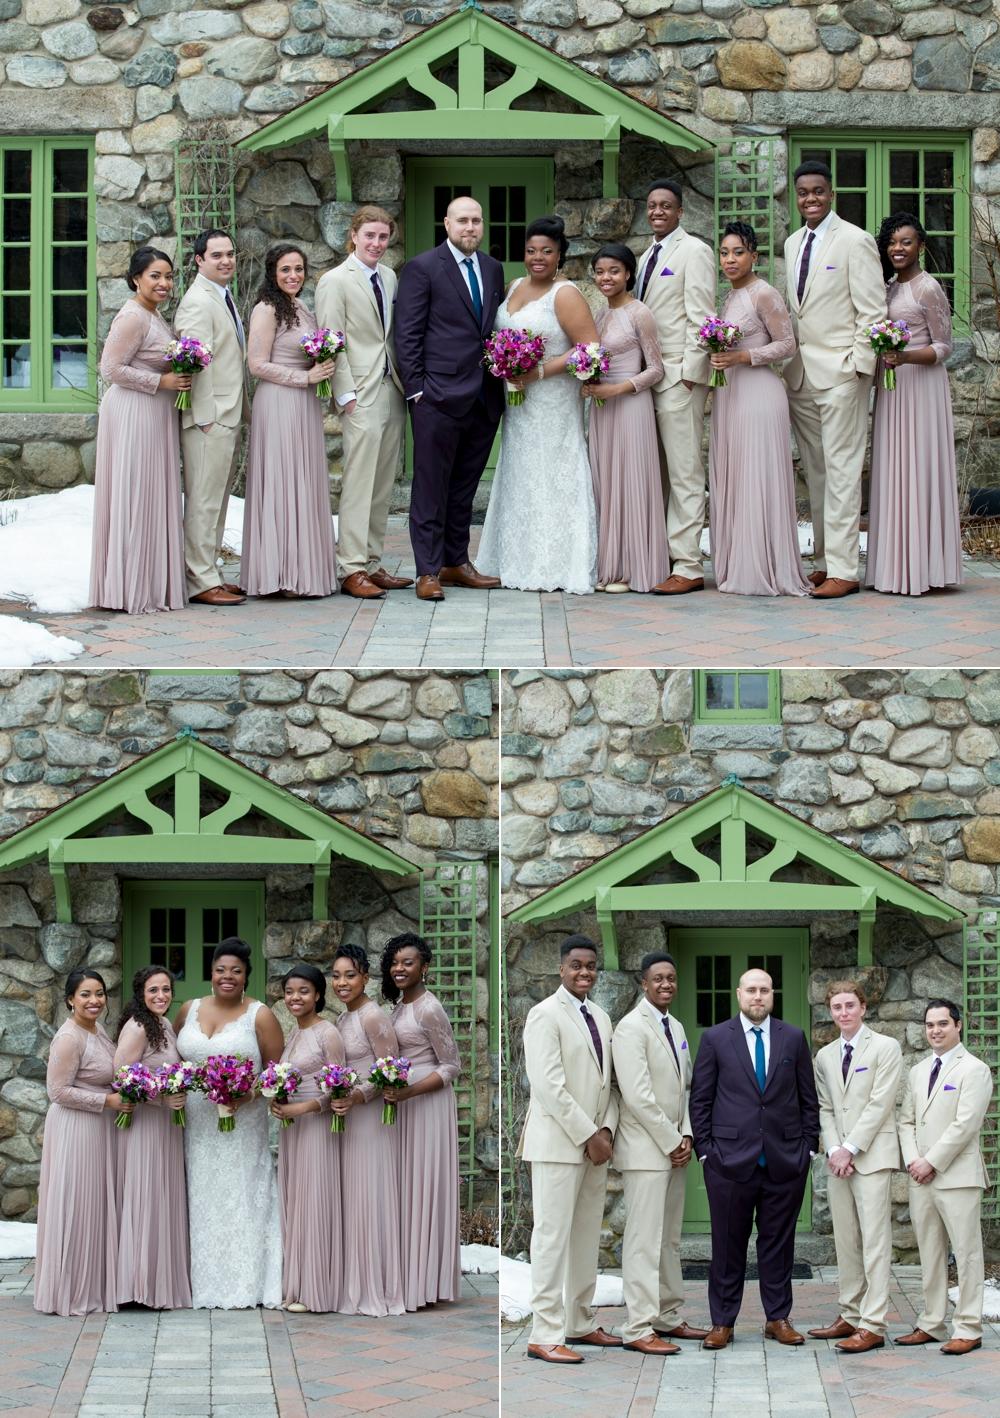 SomerbyJonesPhotography_WillowdaleWedding_Willowdale_Wedding_0031.jpg